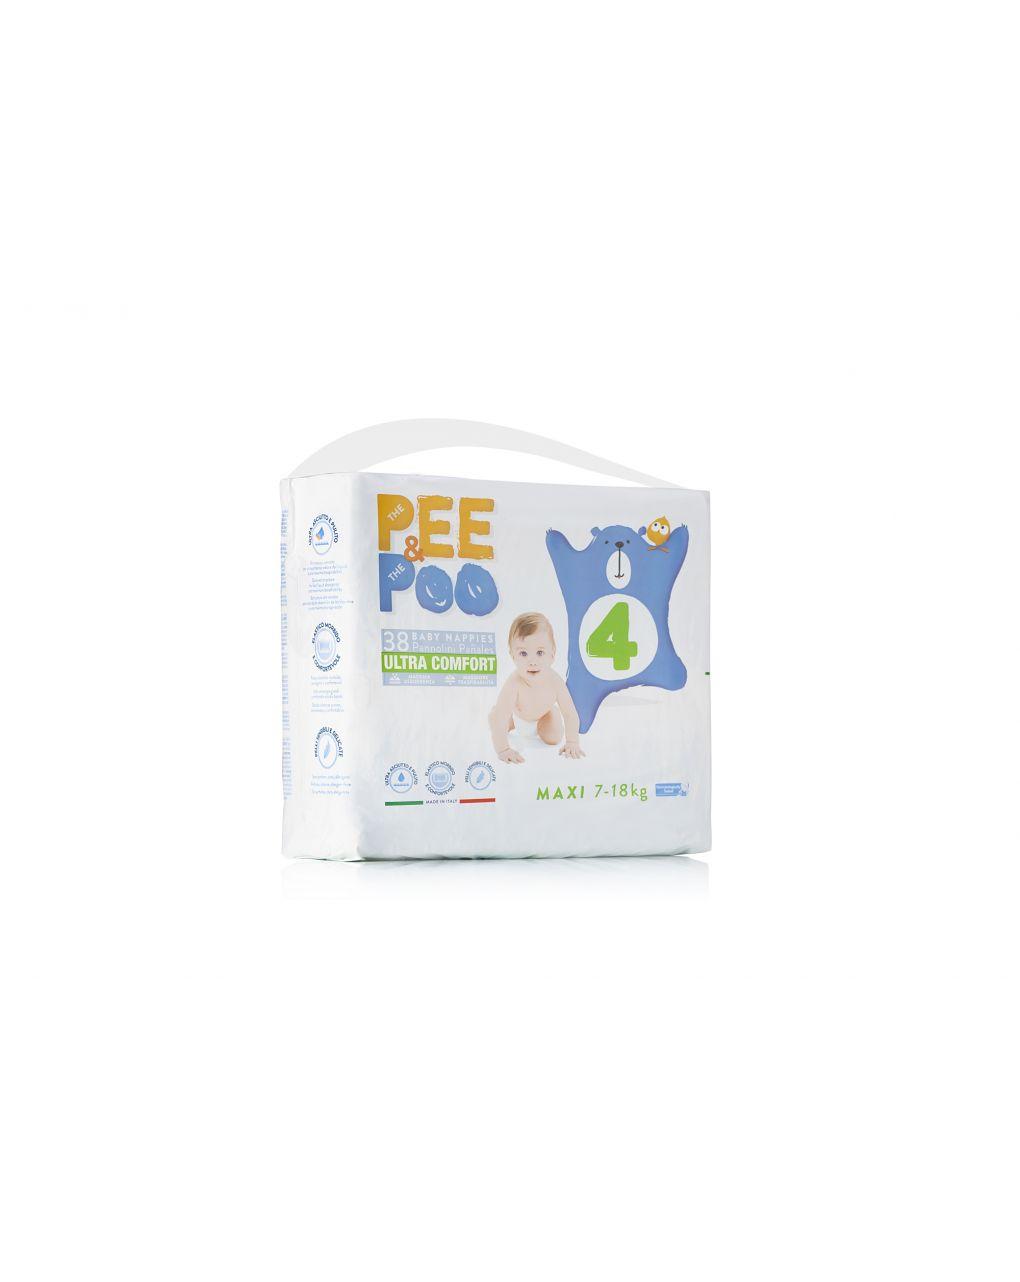 Pee&poo - maxi tg4 38 pz - The Pee & The Poo